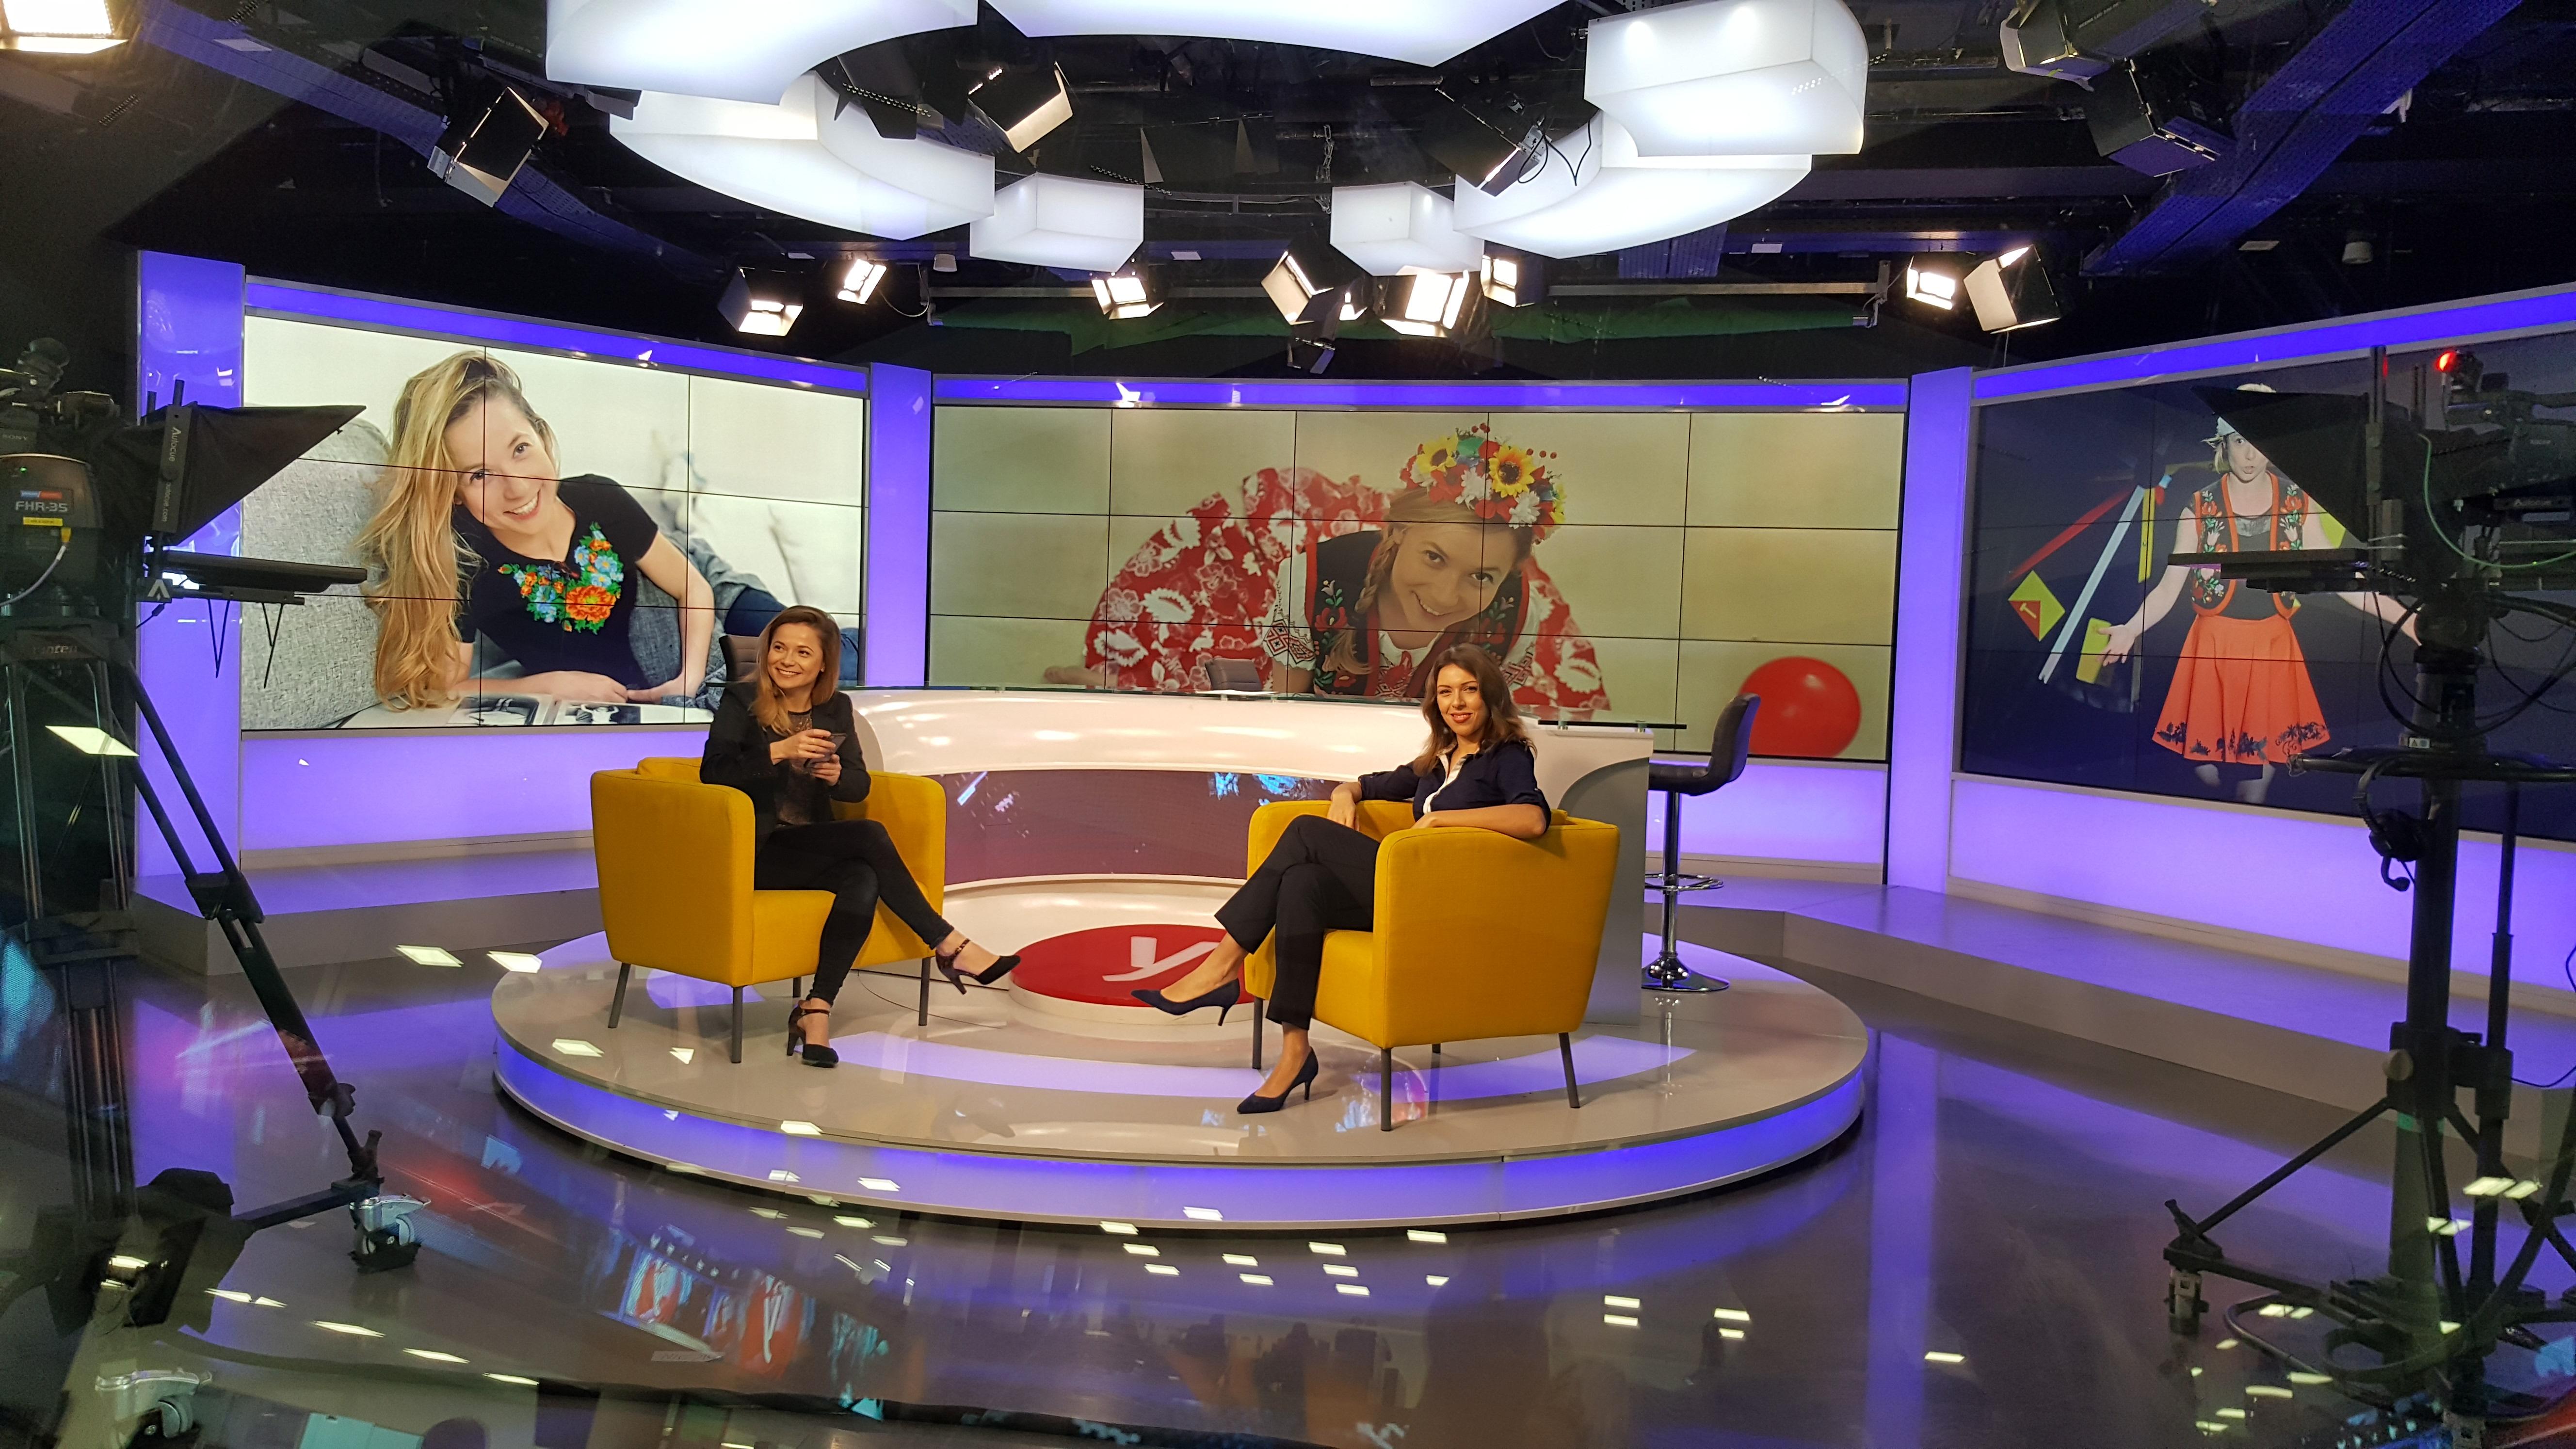 Тамара Клейнгон и журналист Ноа Лави в студии Вести - ynet